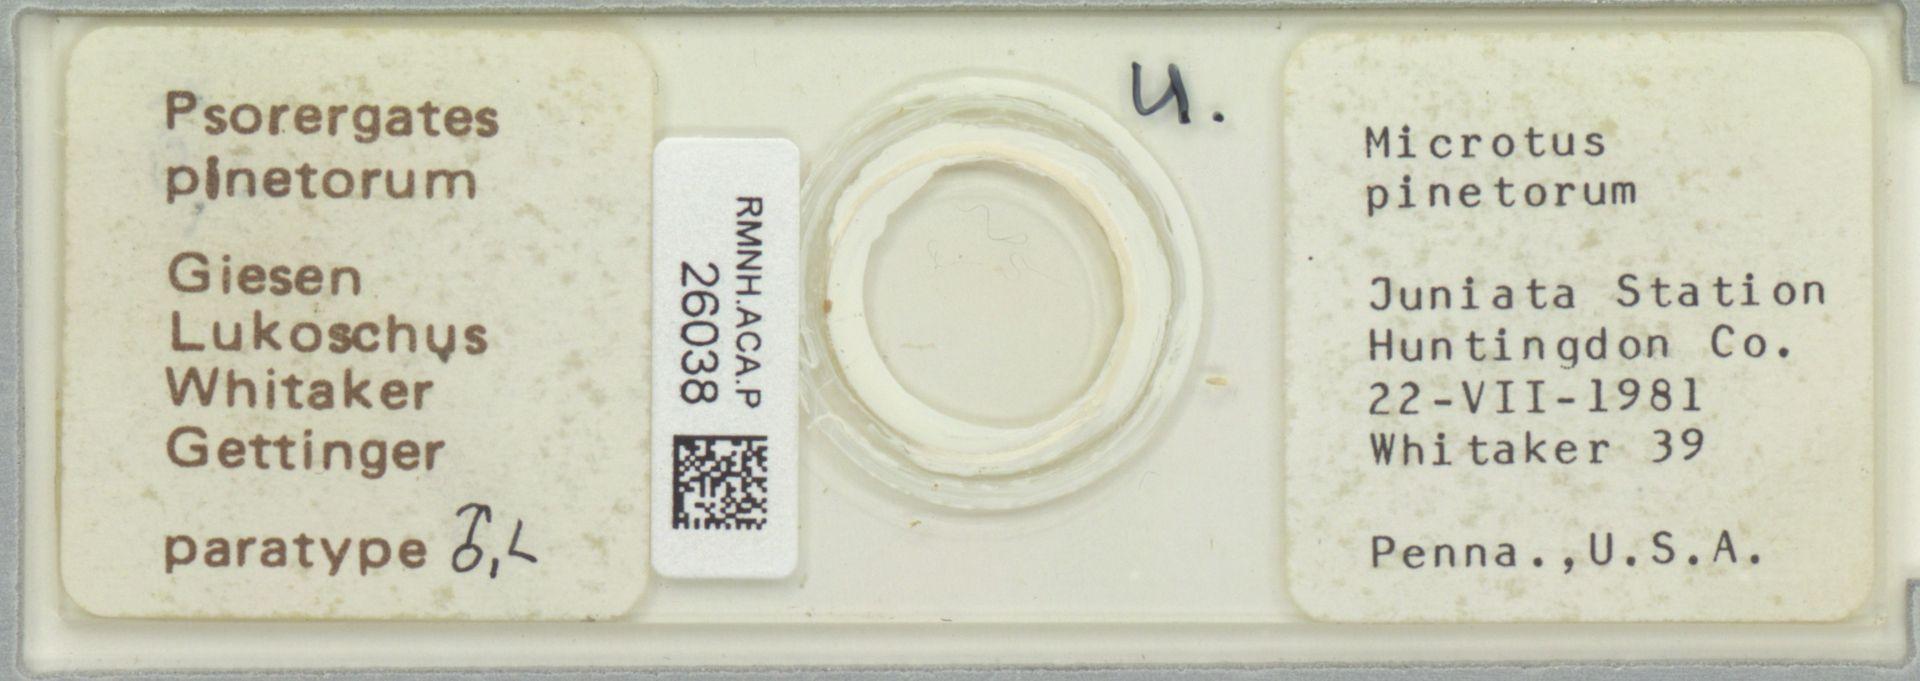 RMNH.ACA.P.26038   Psorergates pinetorum Giesen Lukoschus Whitaker Gettinger